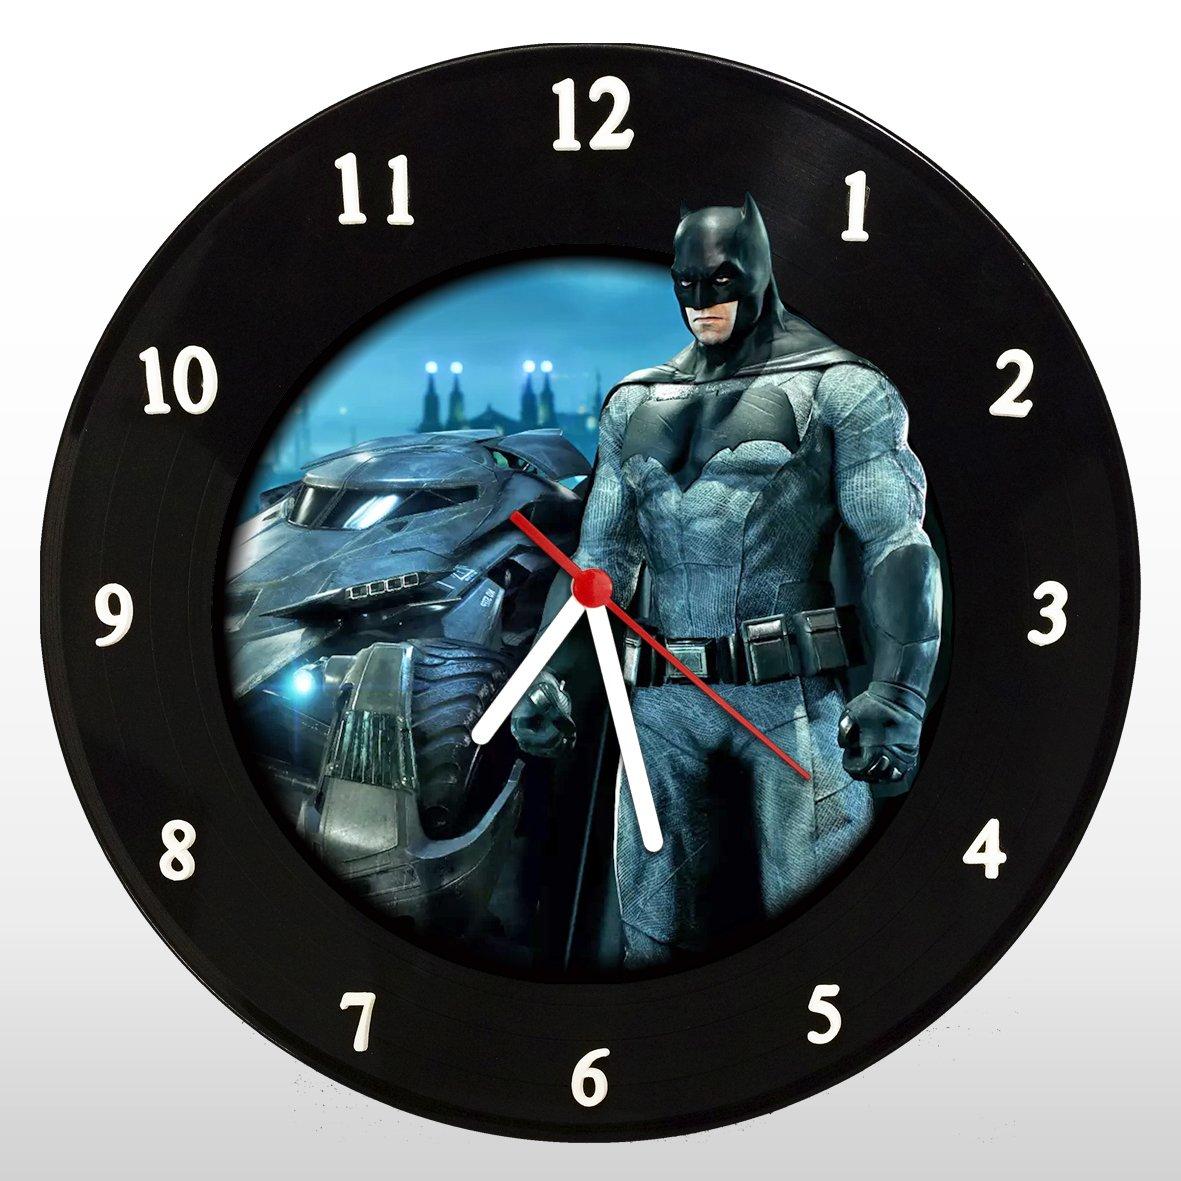 Batman - Relógio de Parede em Disco de Vinil - Mr. Rock